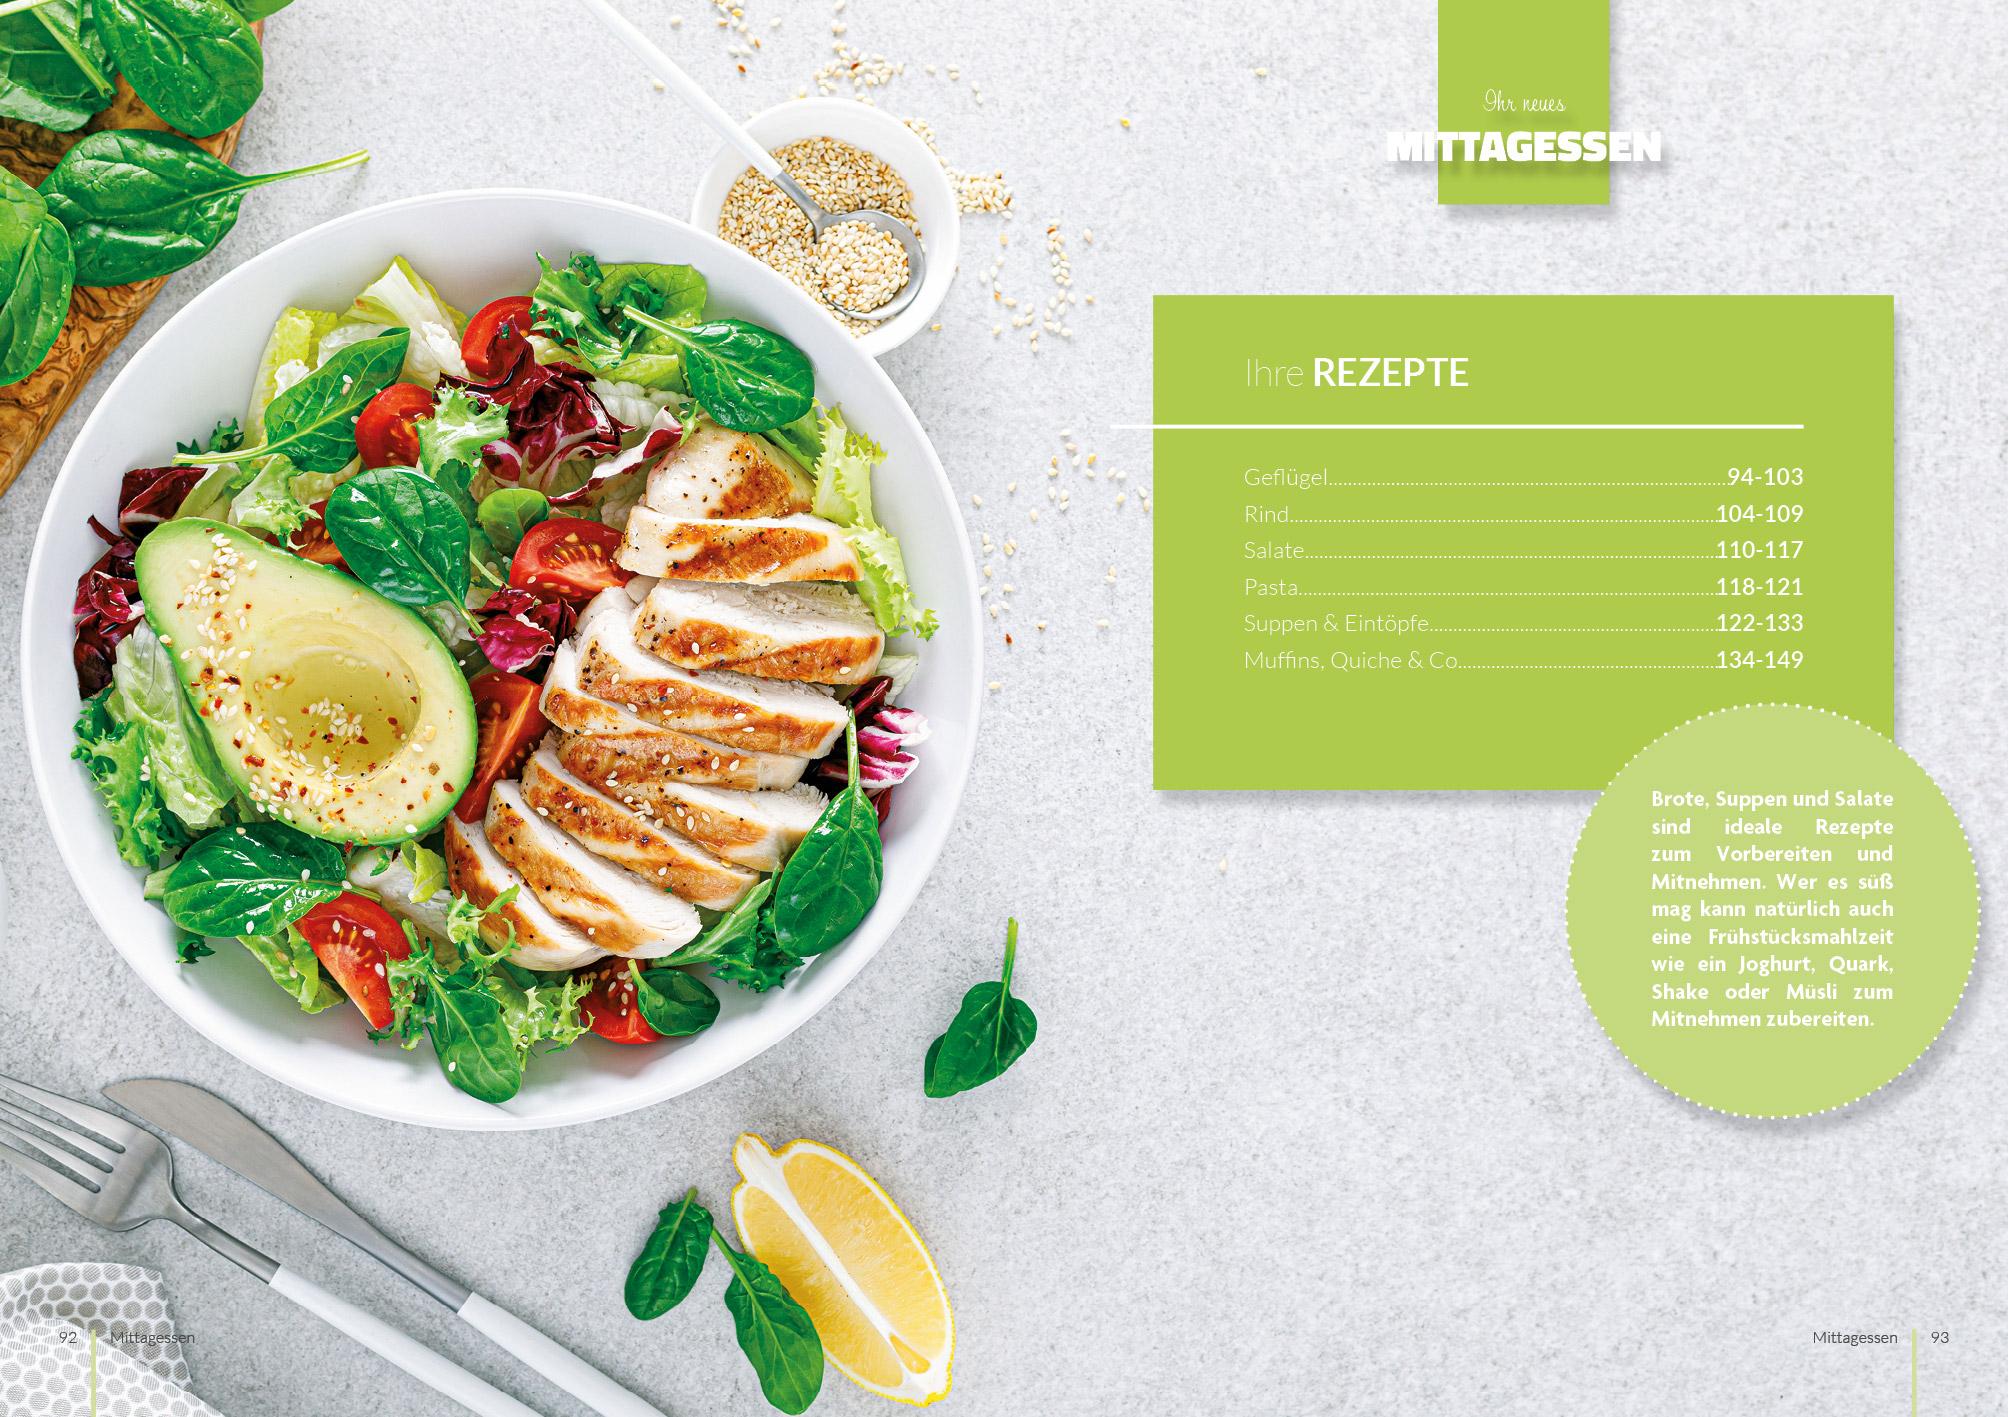 high-protein-kochbuch-zum-abnehmen-gratis5